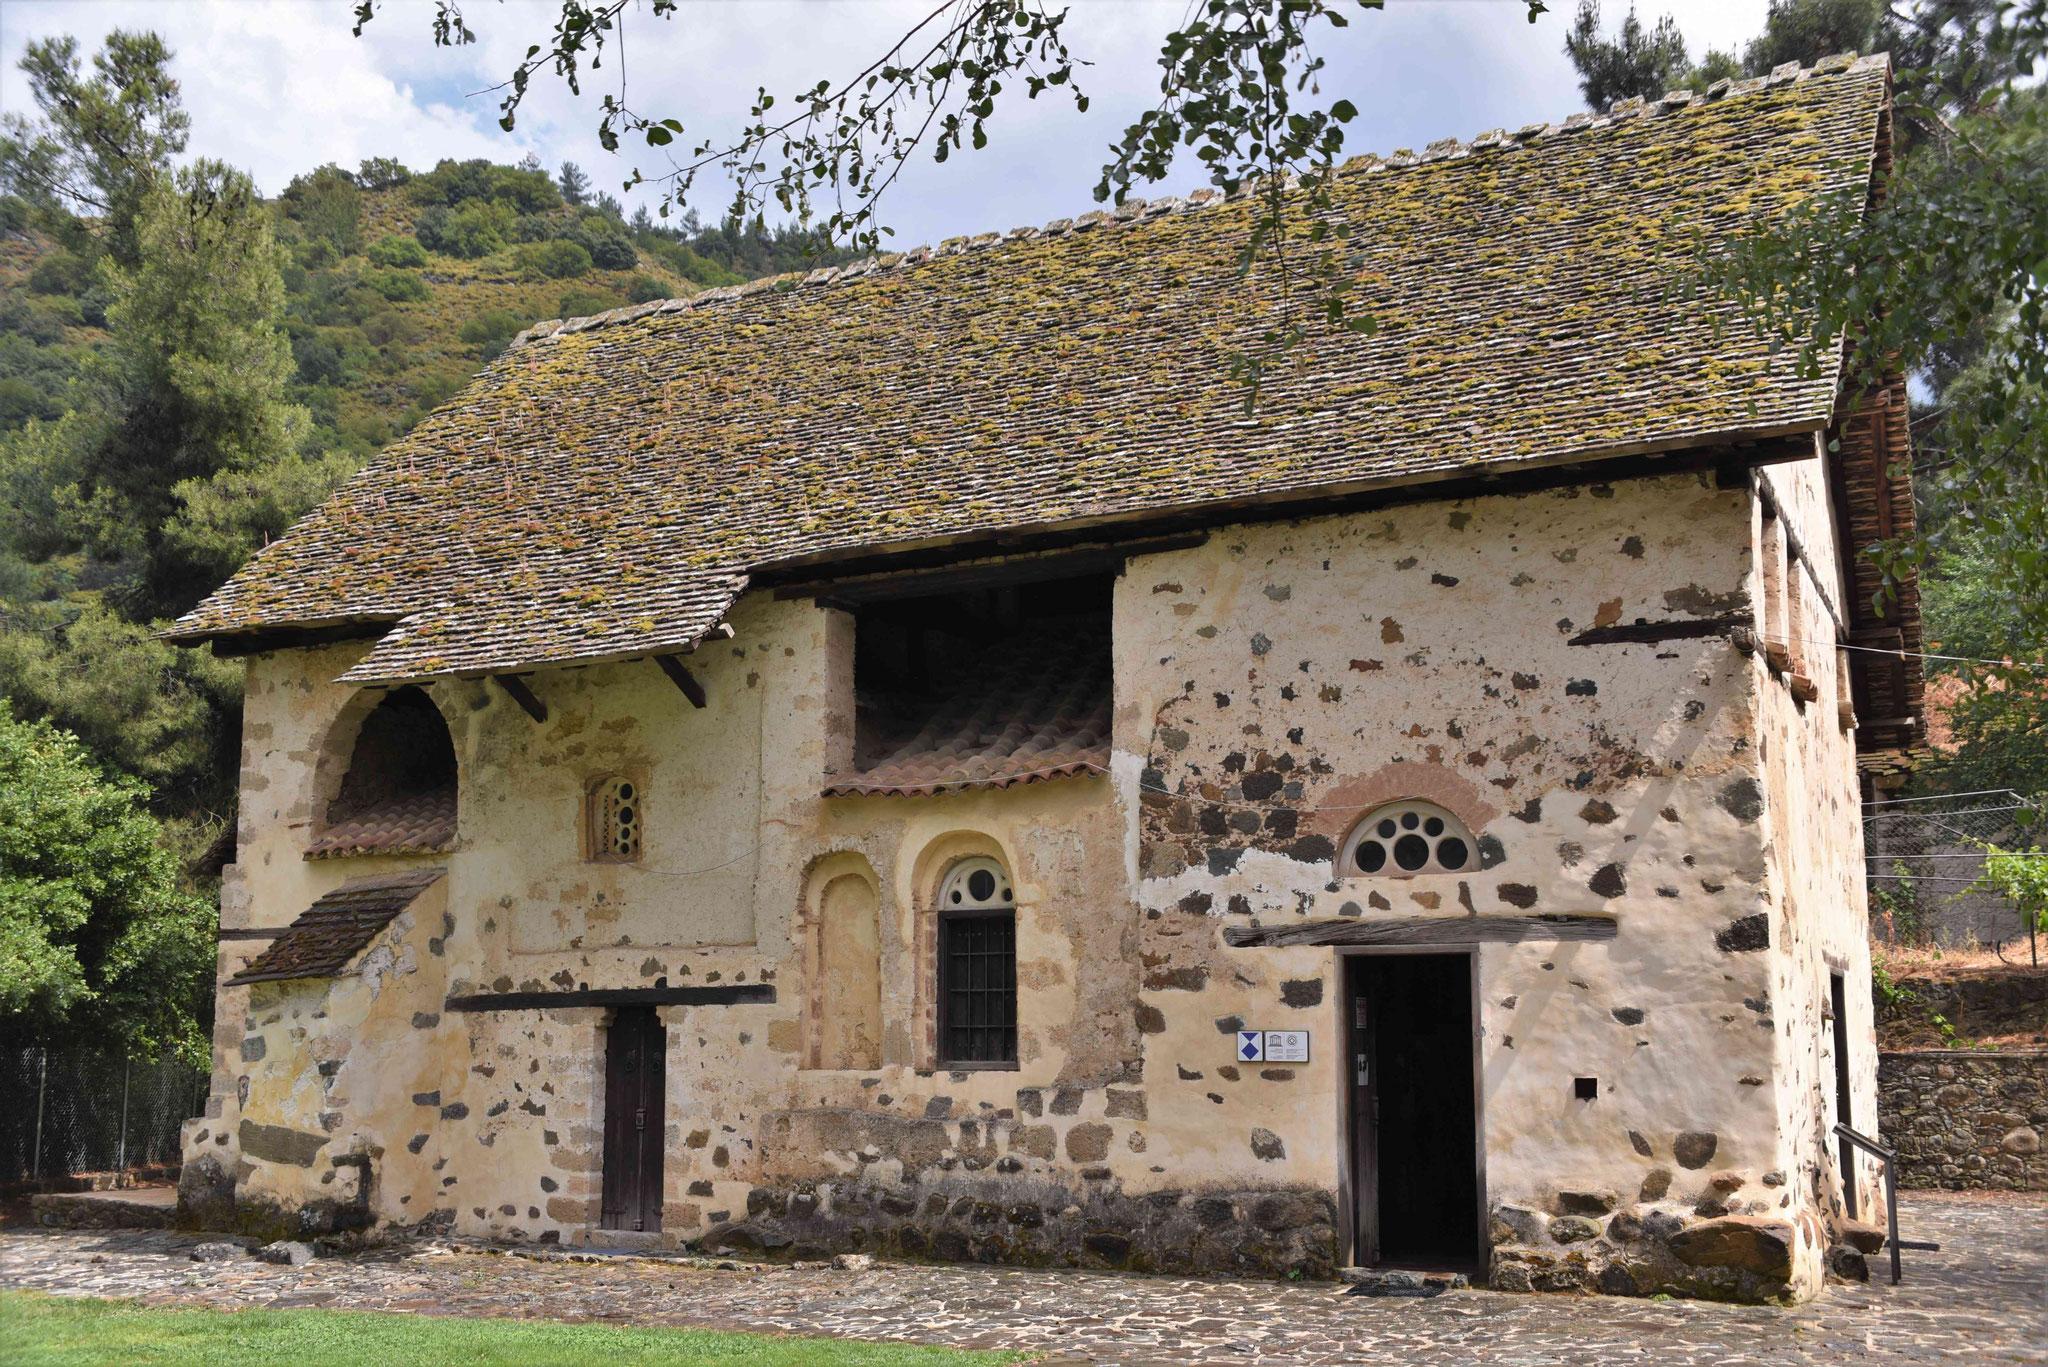 Hier sieht man das Dach der Kirche unter dem Scheunendach